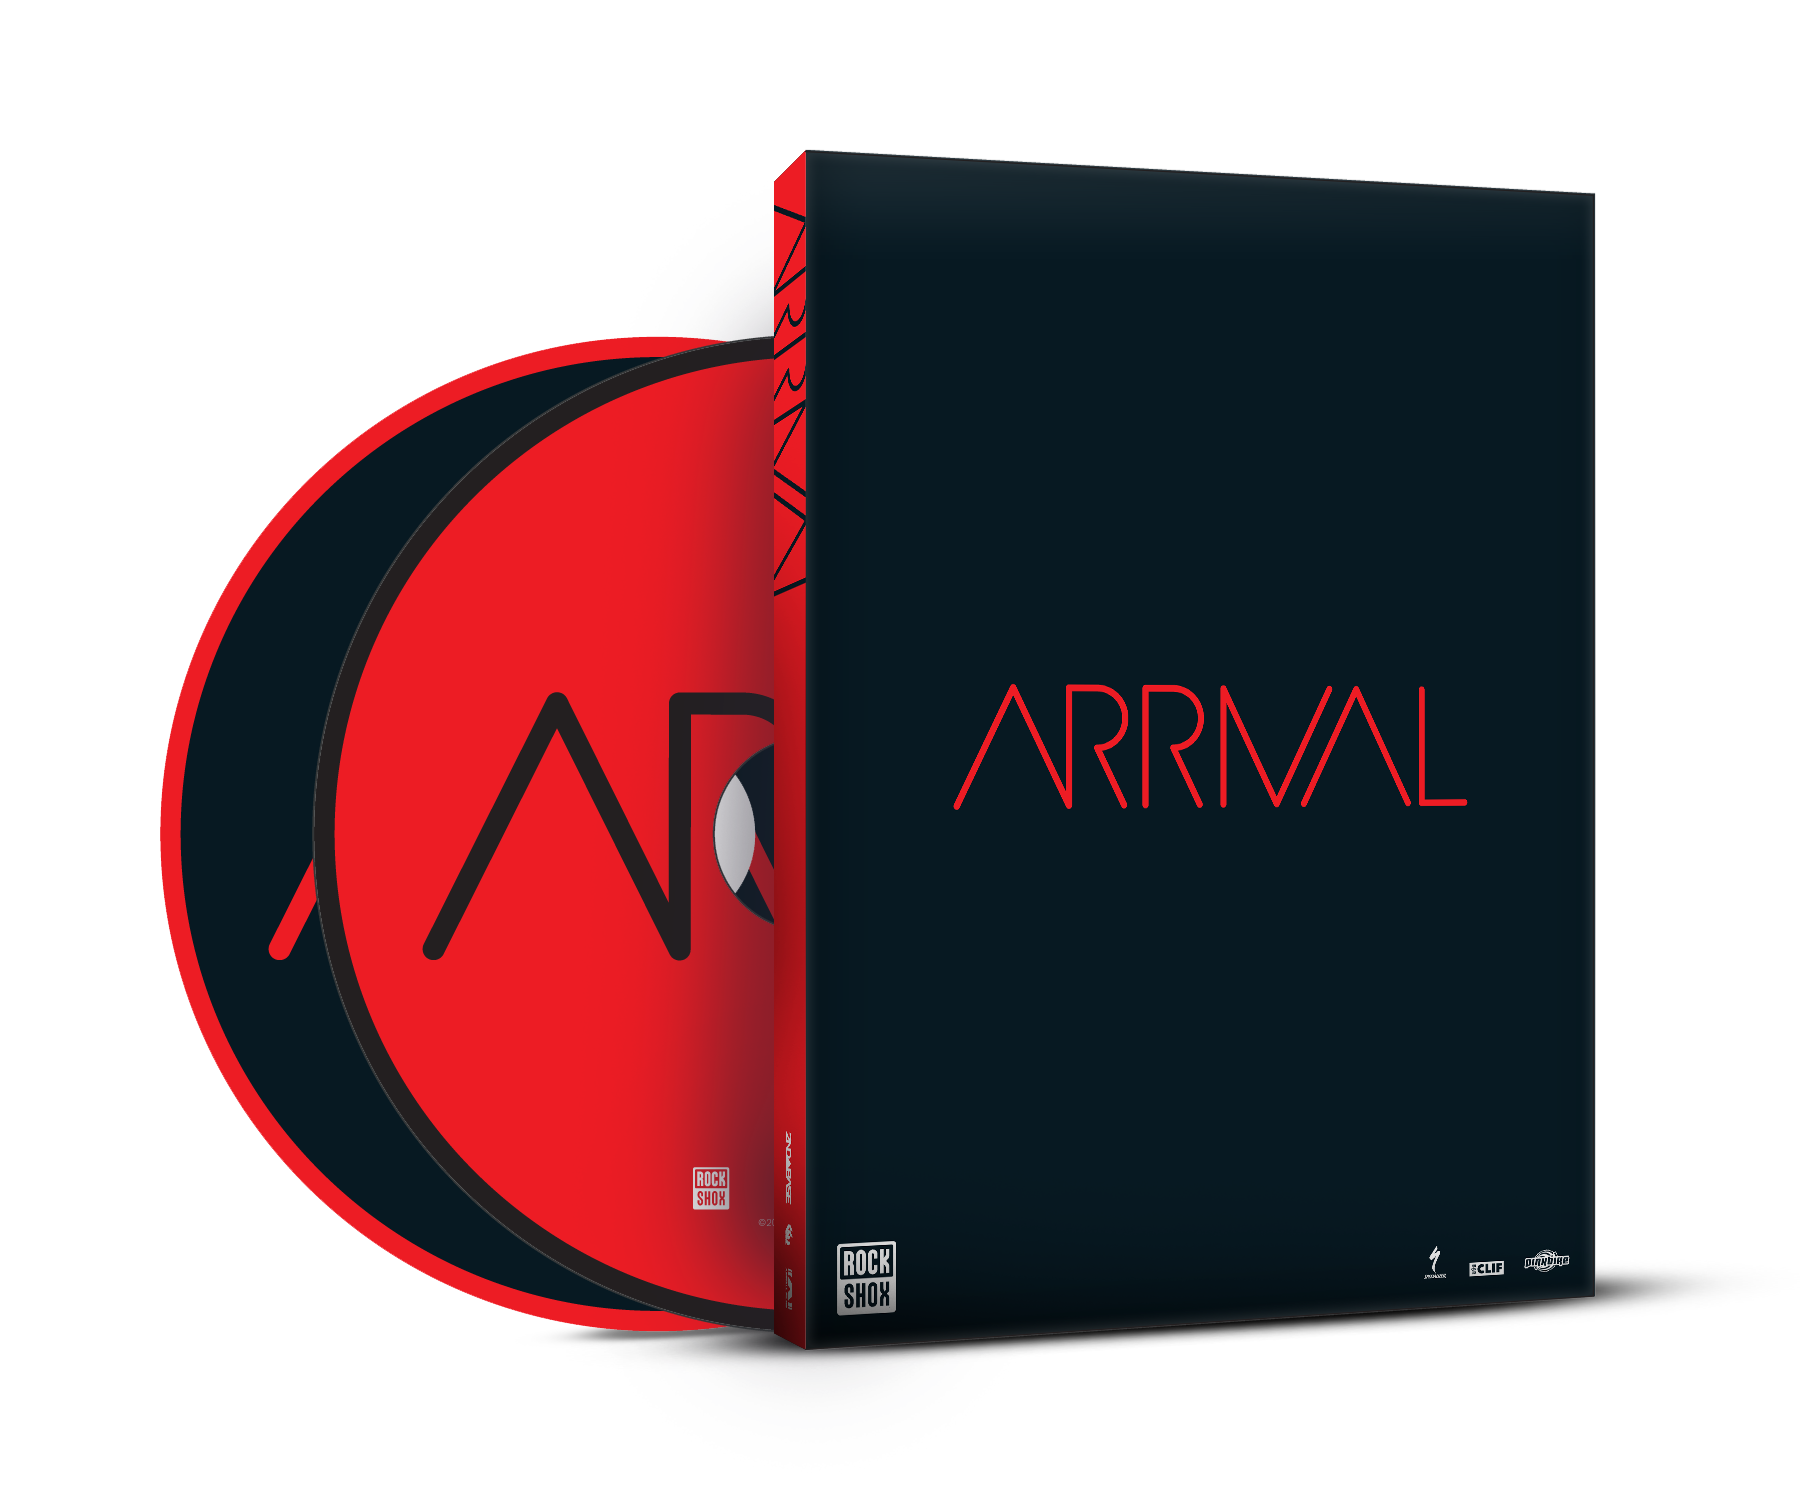 Arrival - DVD/BluRay Dics